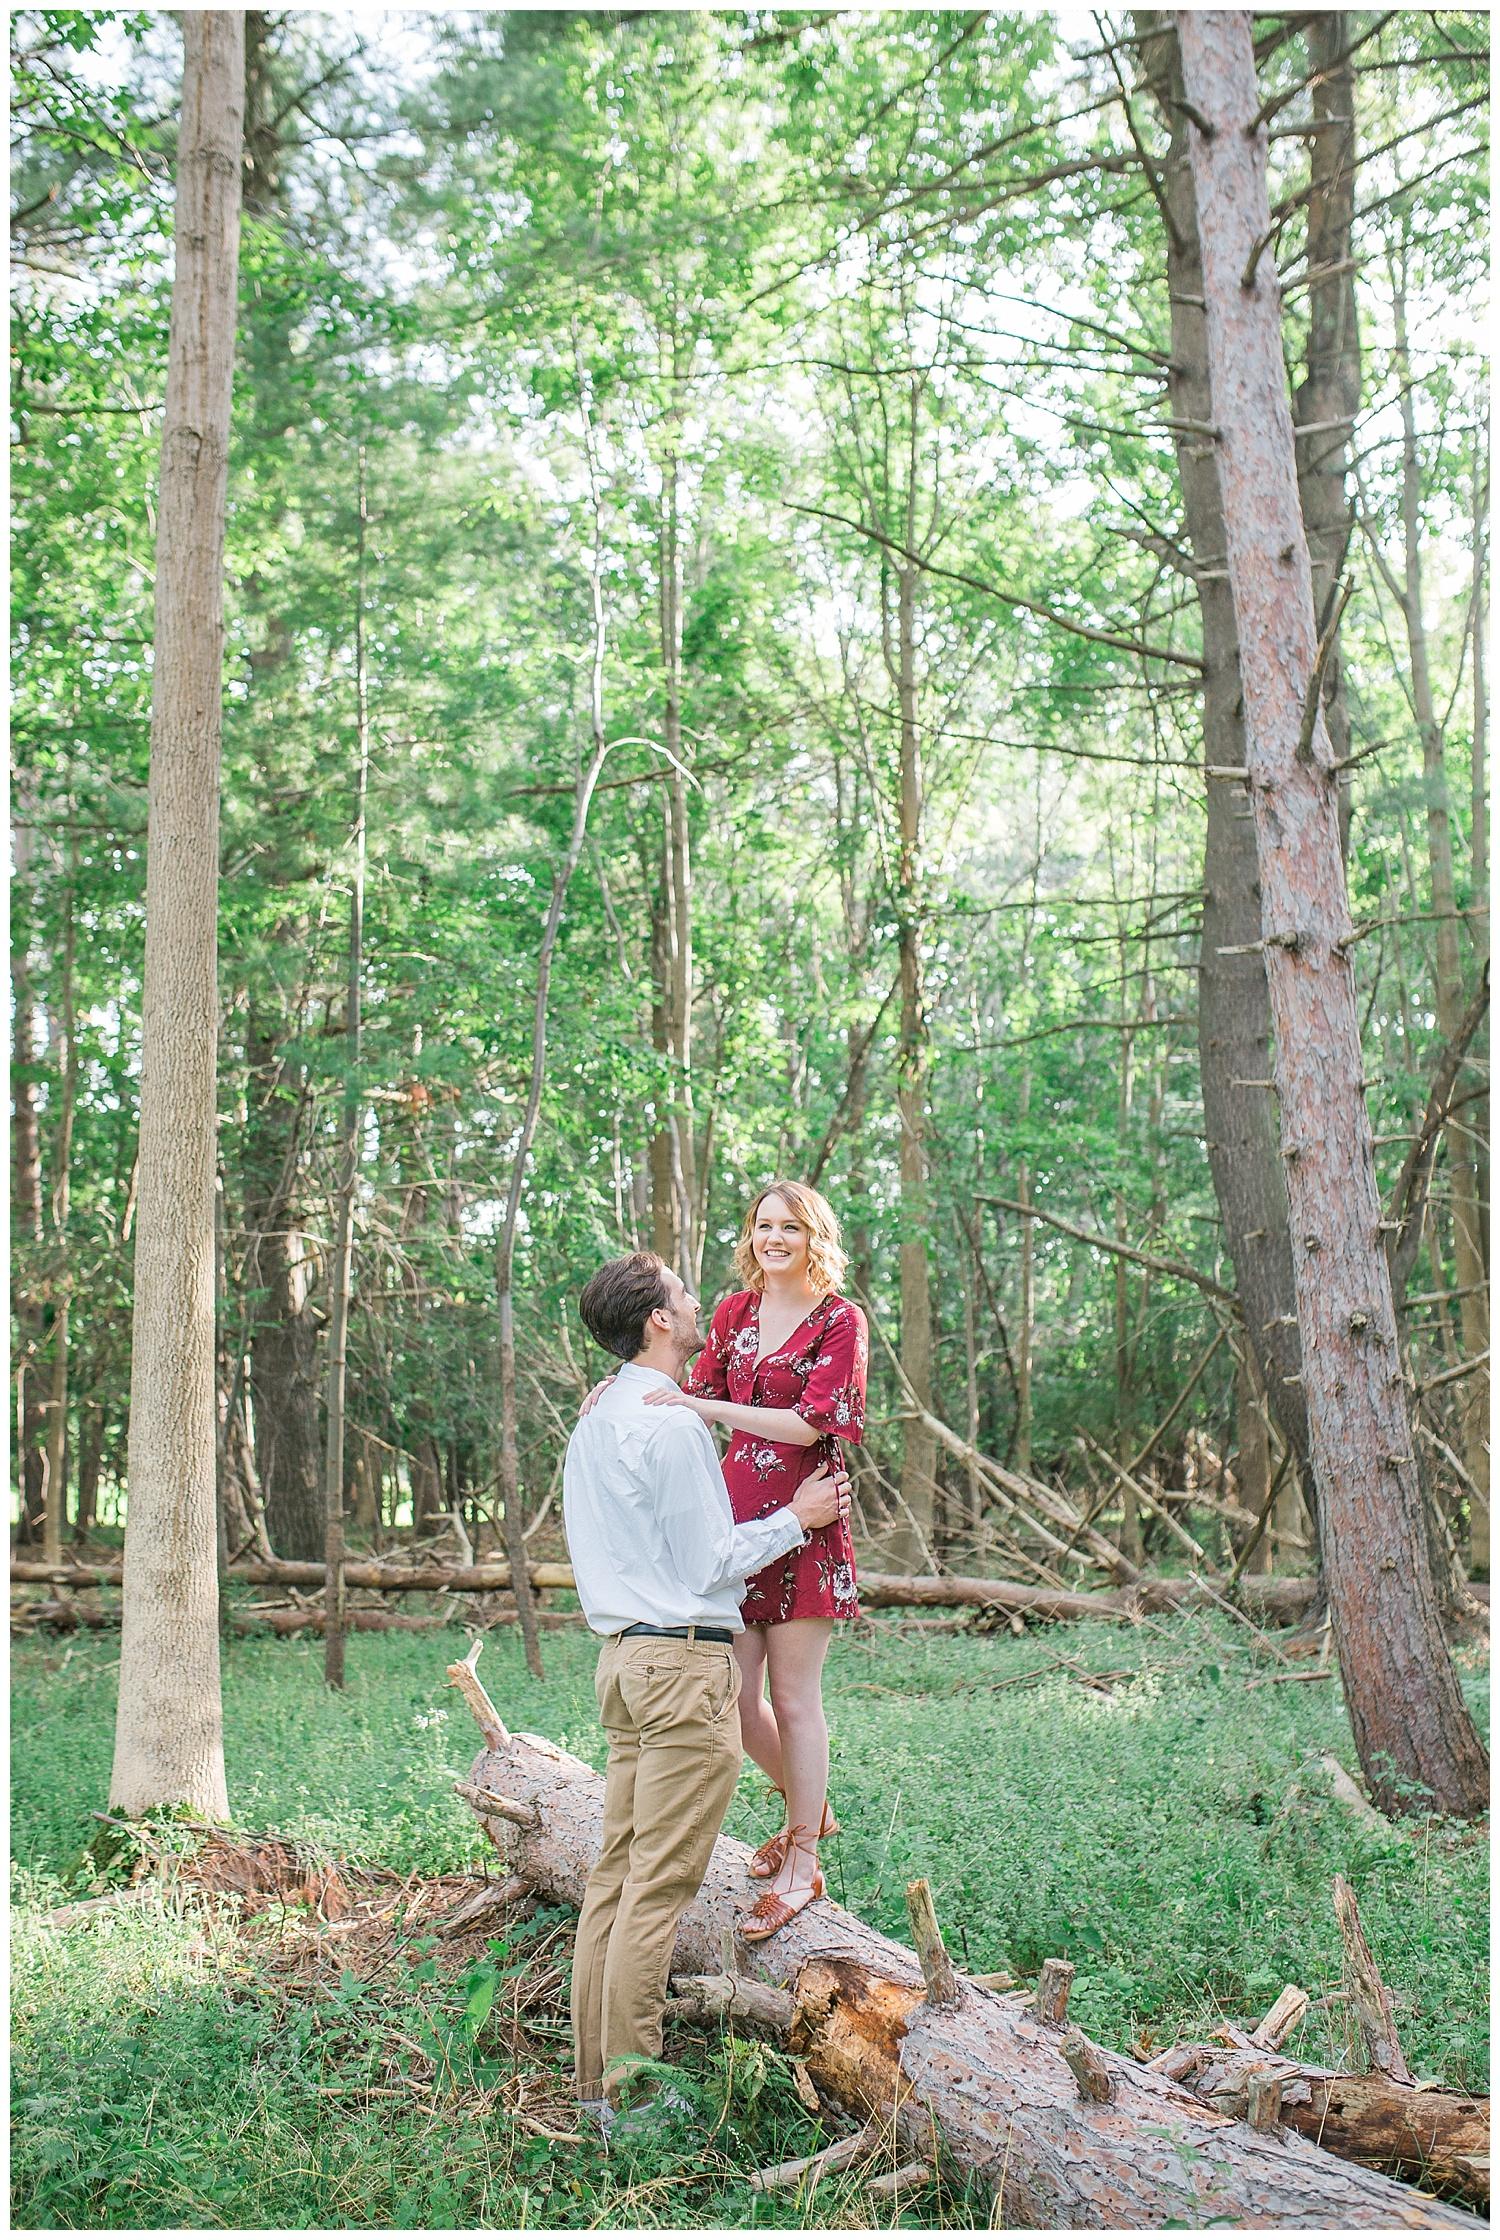 Tanya and Ryan - Sweetheart session - Lass & Beau - Geneseo NY-23_Buffalo wedding photography.jpg